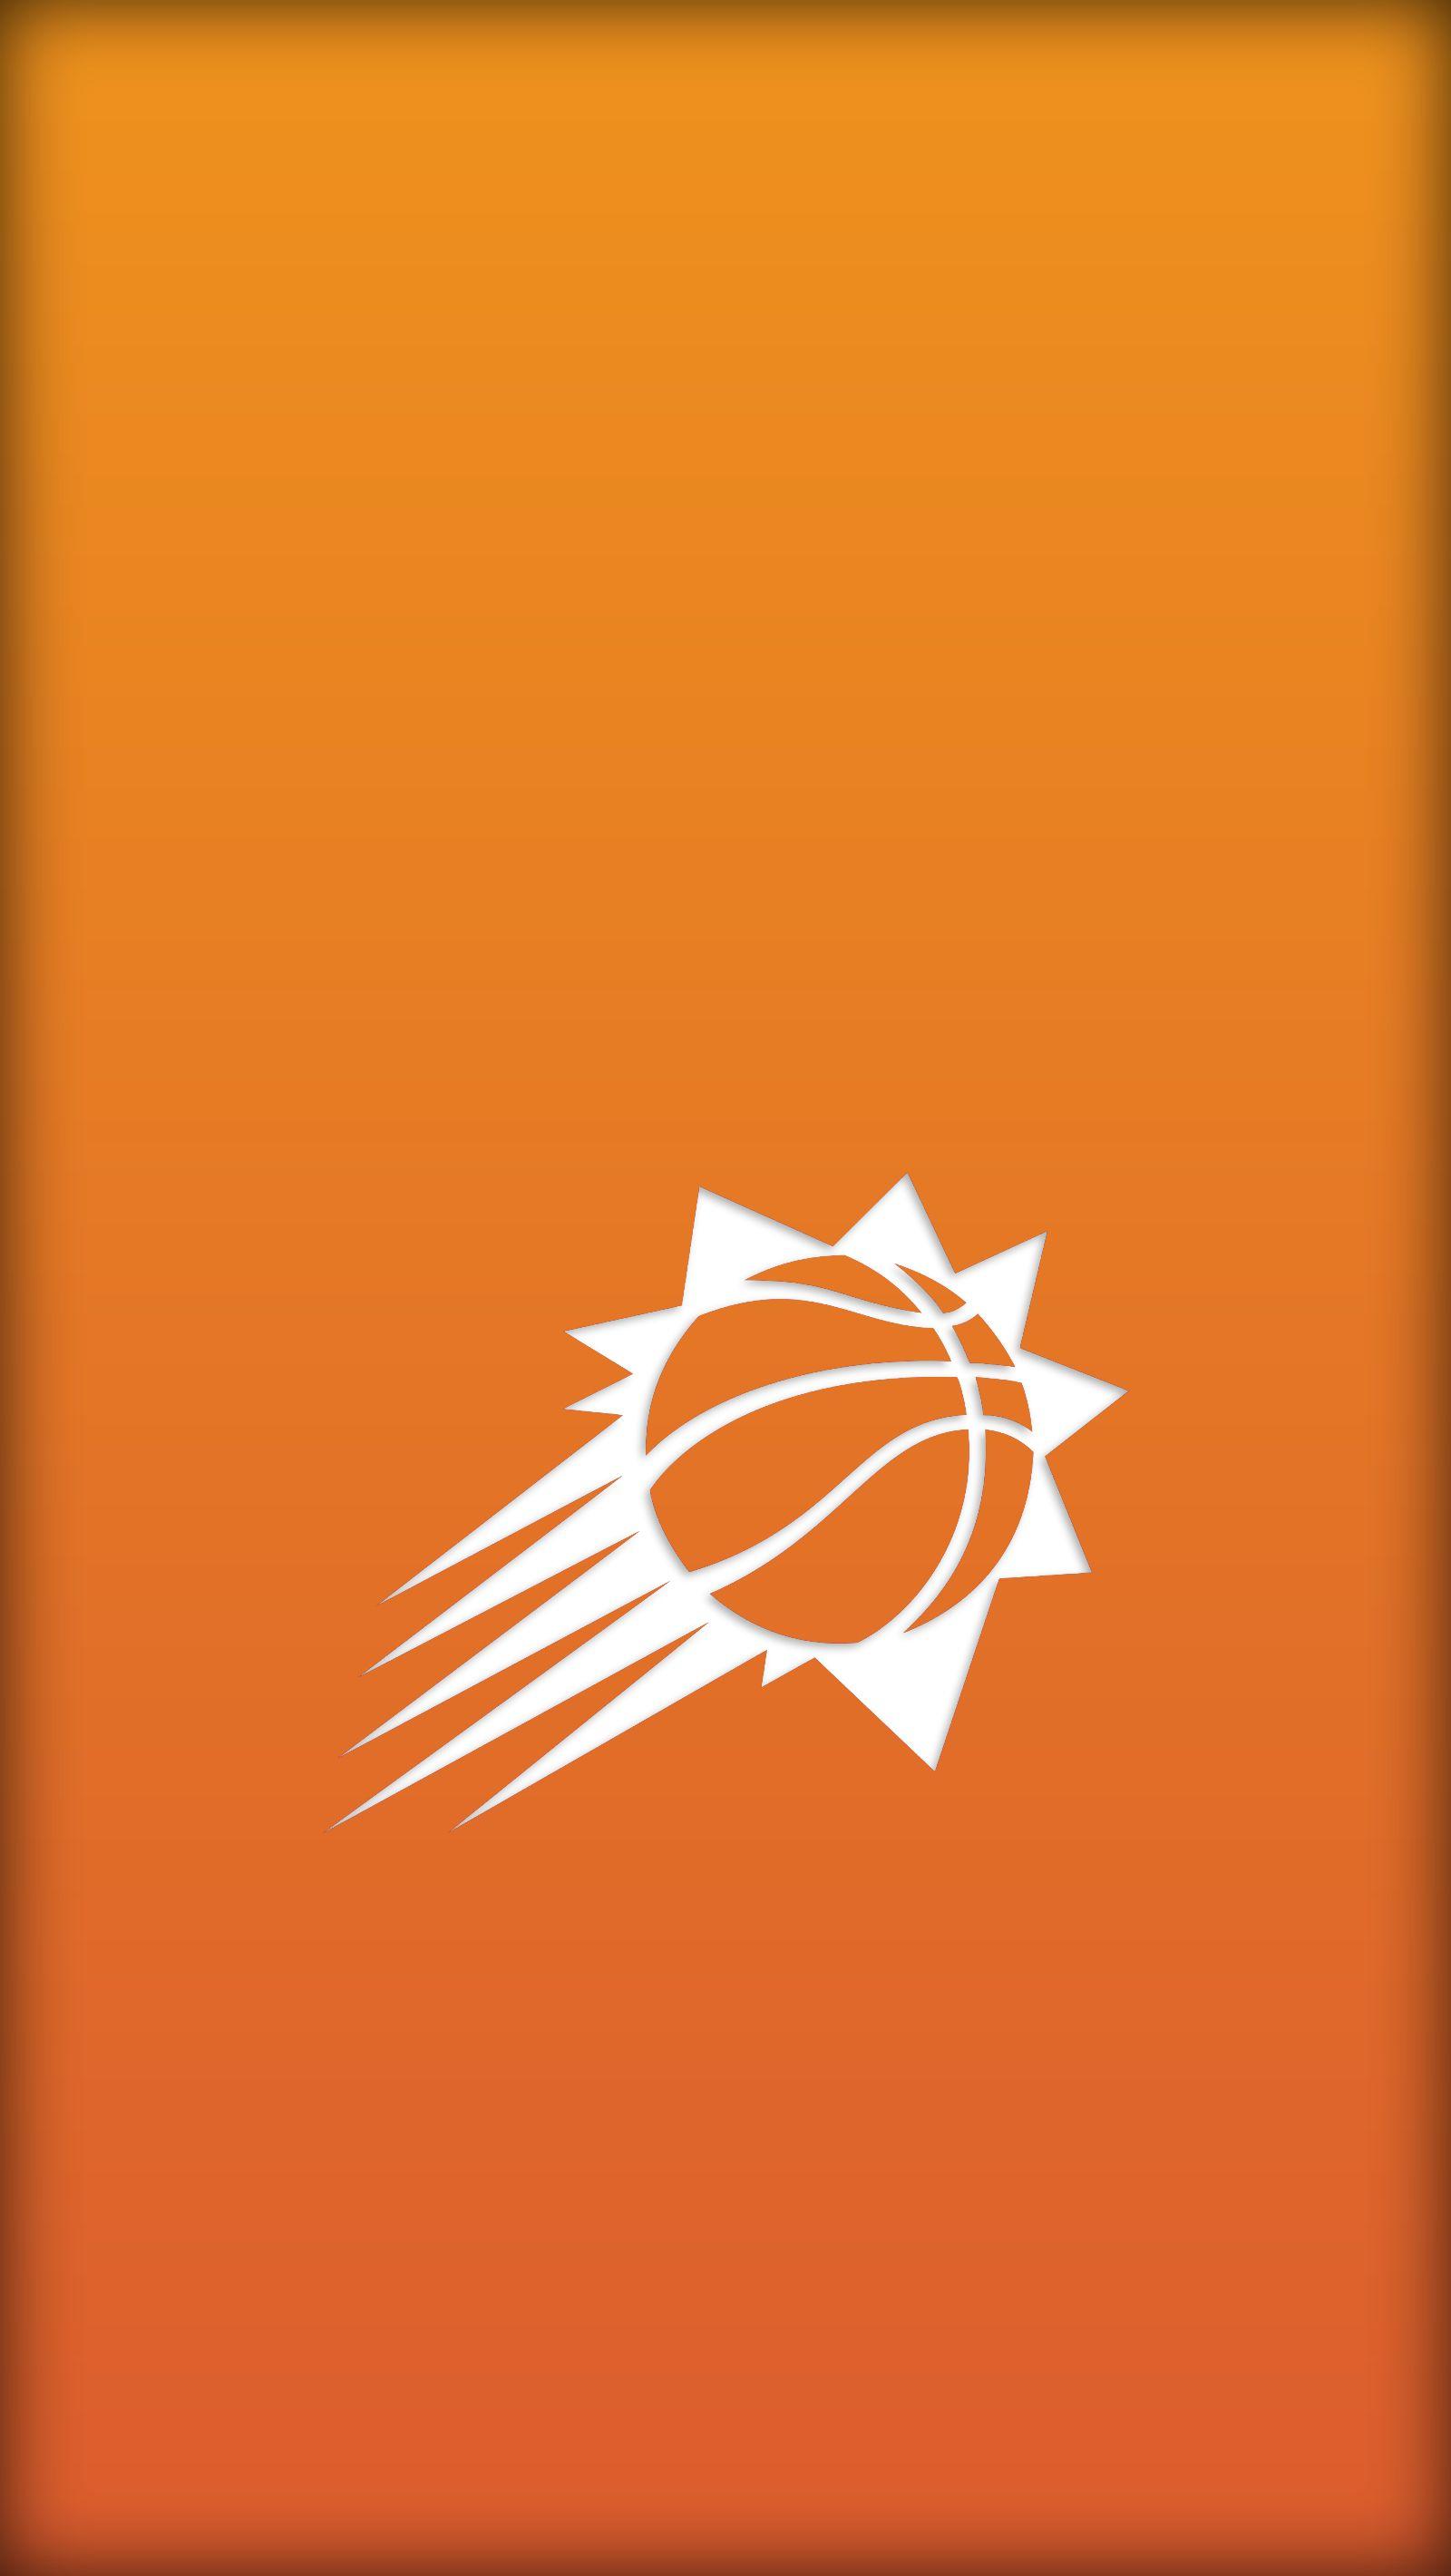 sportsign Shop Redbubble Phoenix suns basketball Suns 1600x2840